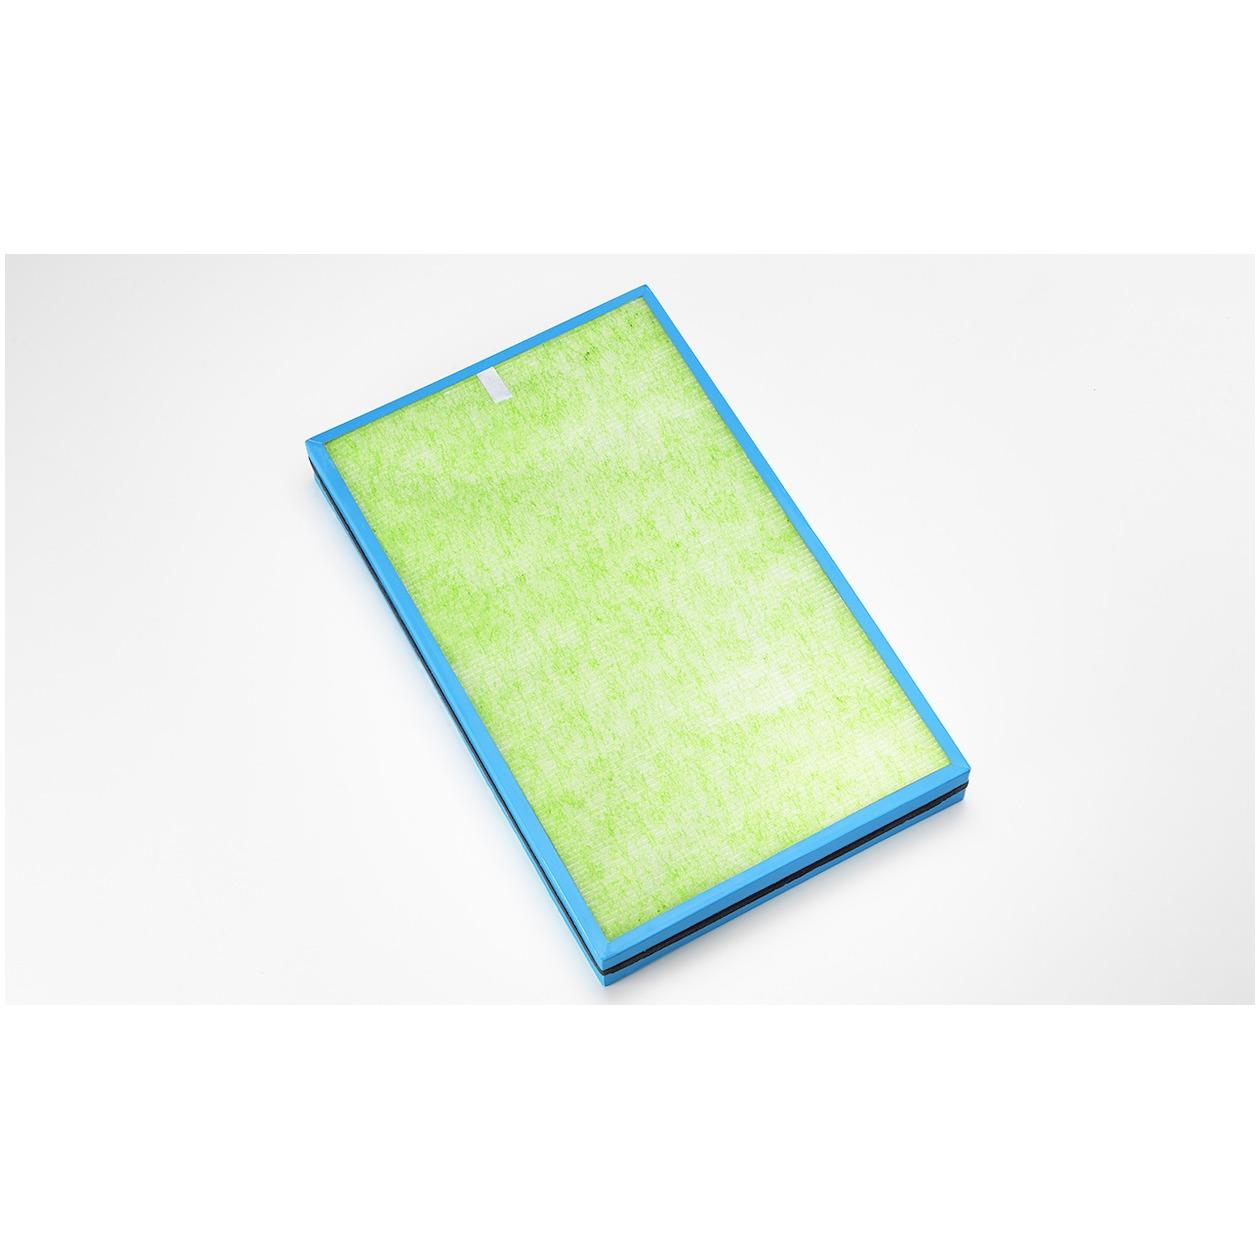 Boneco klimaat accessoire Filter A402